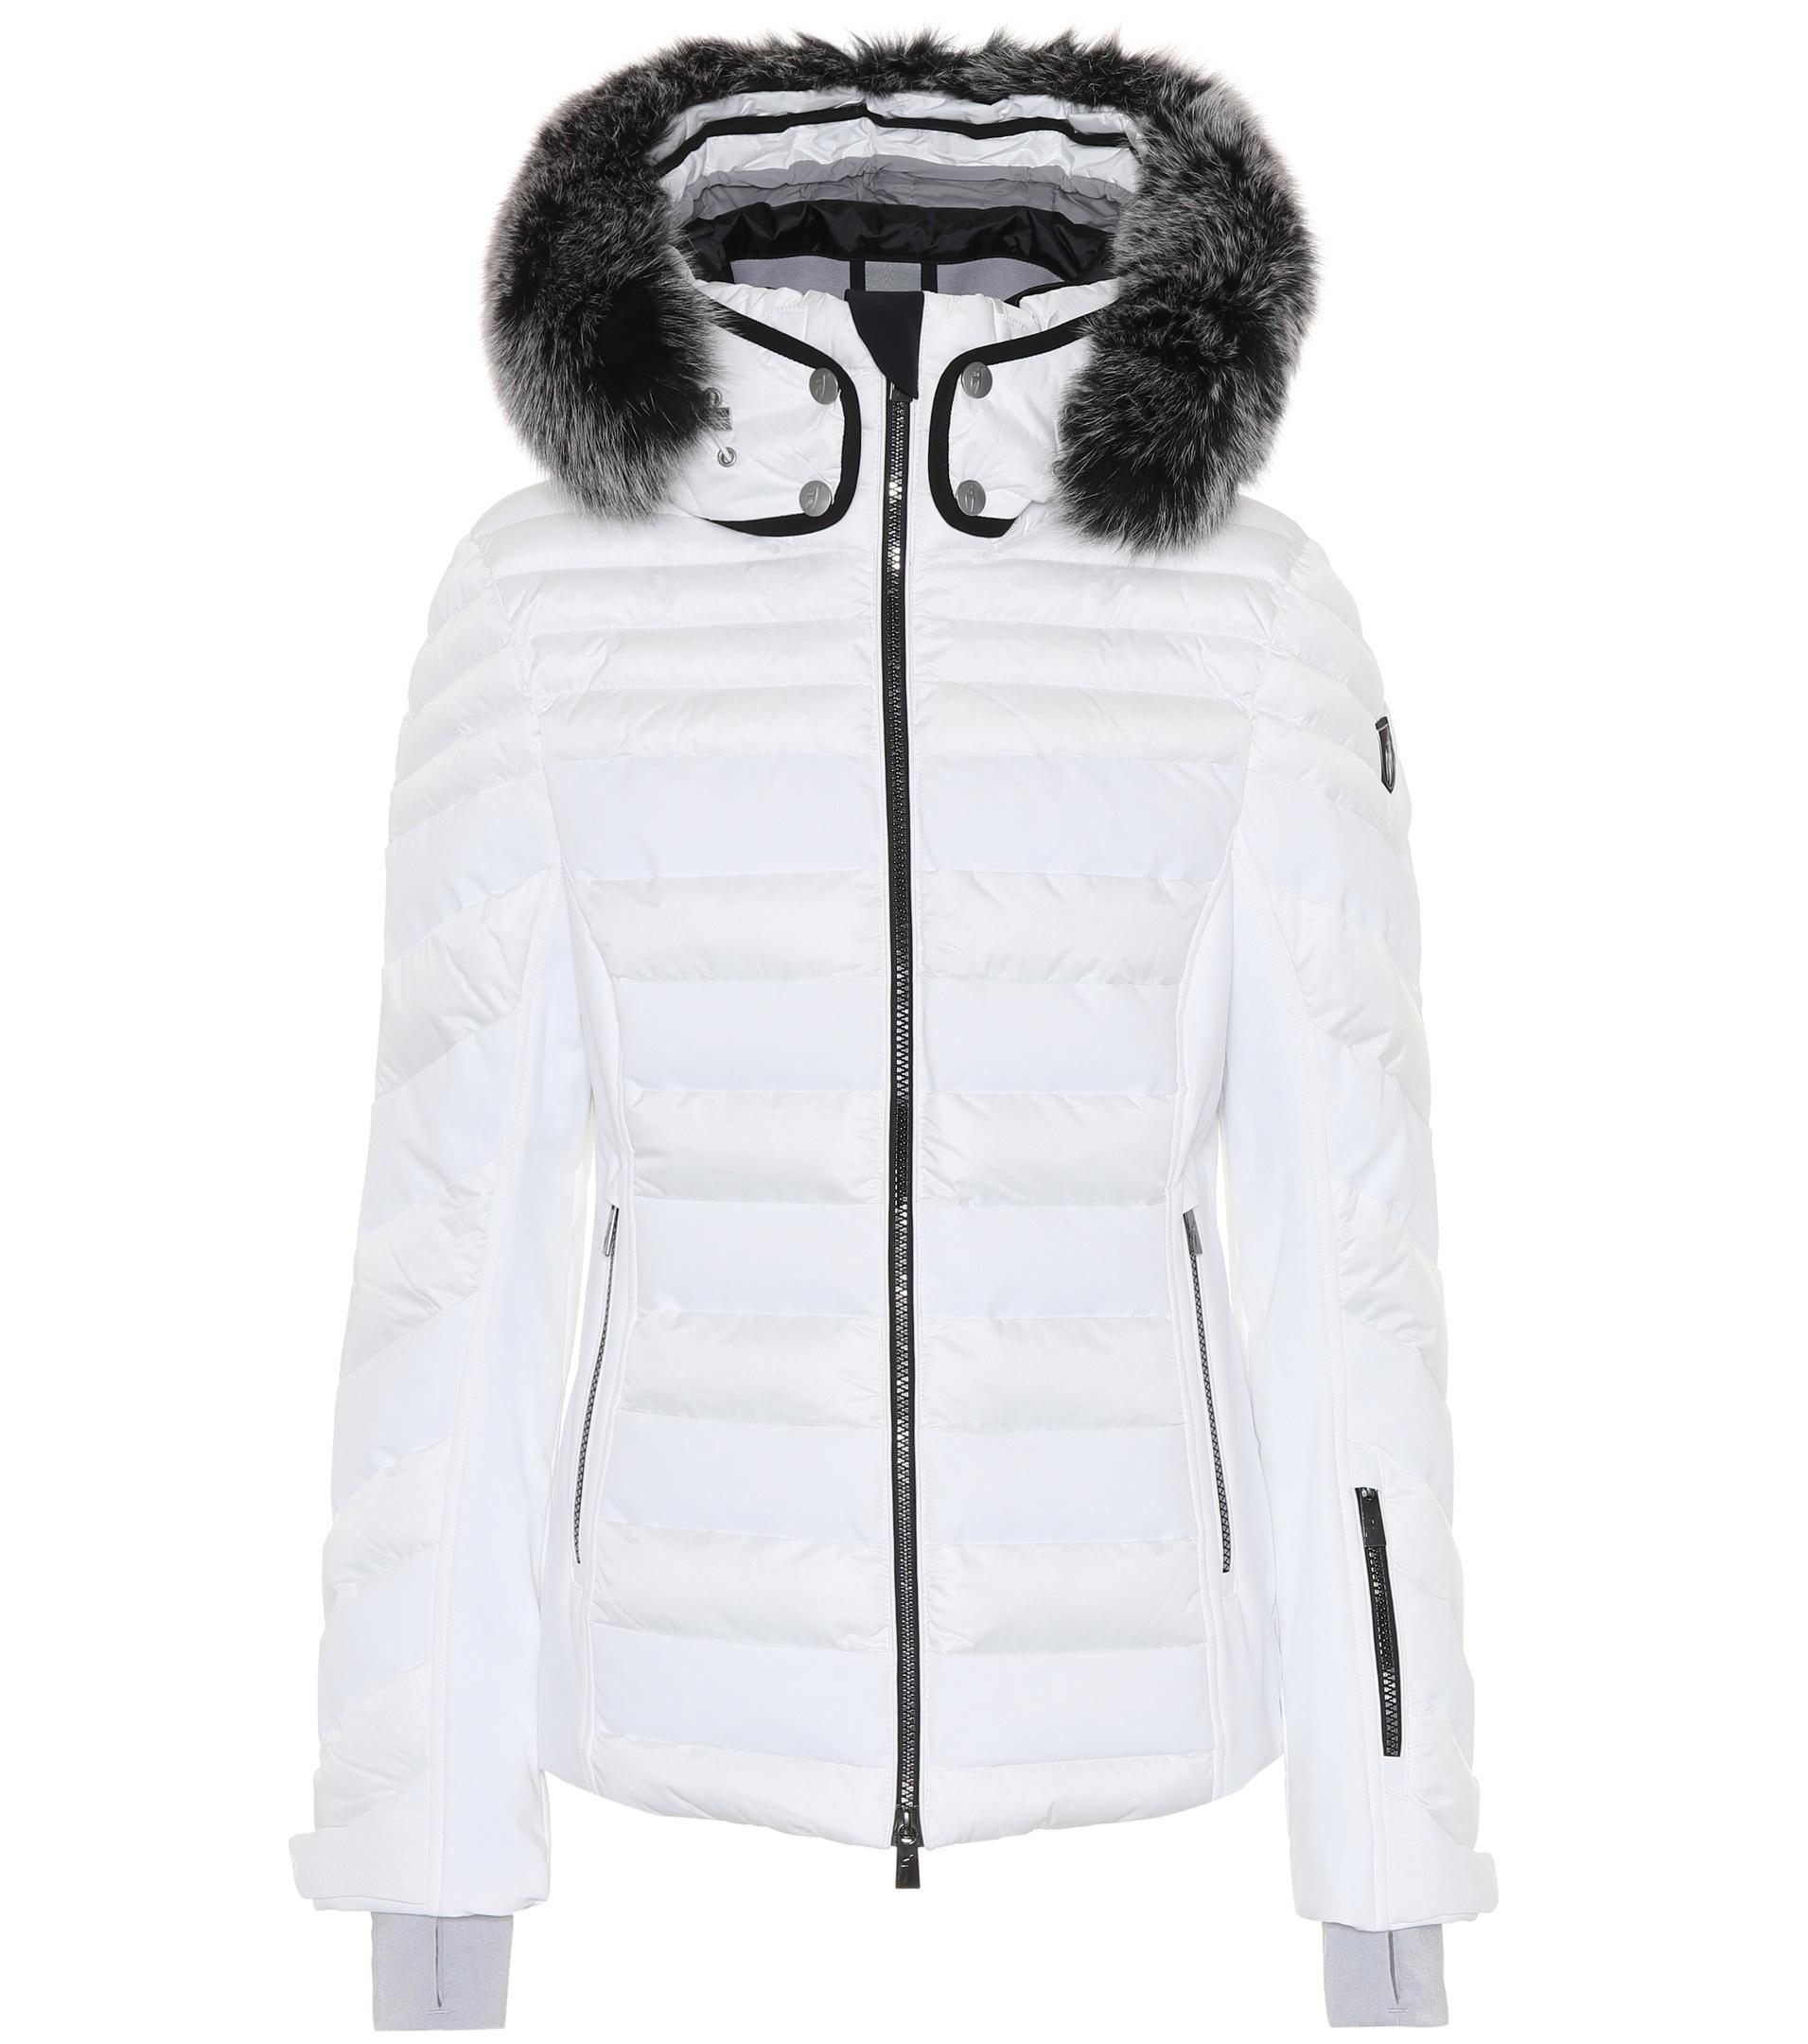 e3d92b3e298 Lyst - Toni Sailer Dioline Fur-trimmed Ski Jacket in White